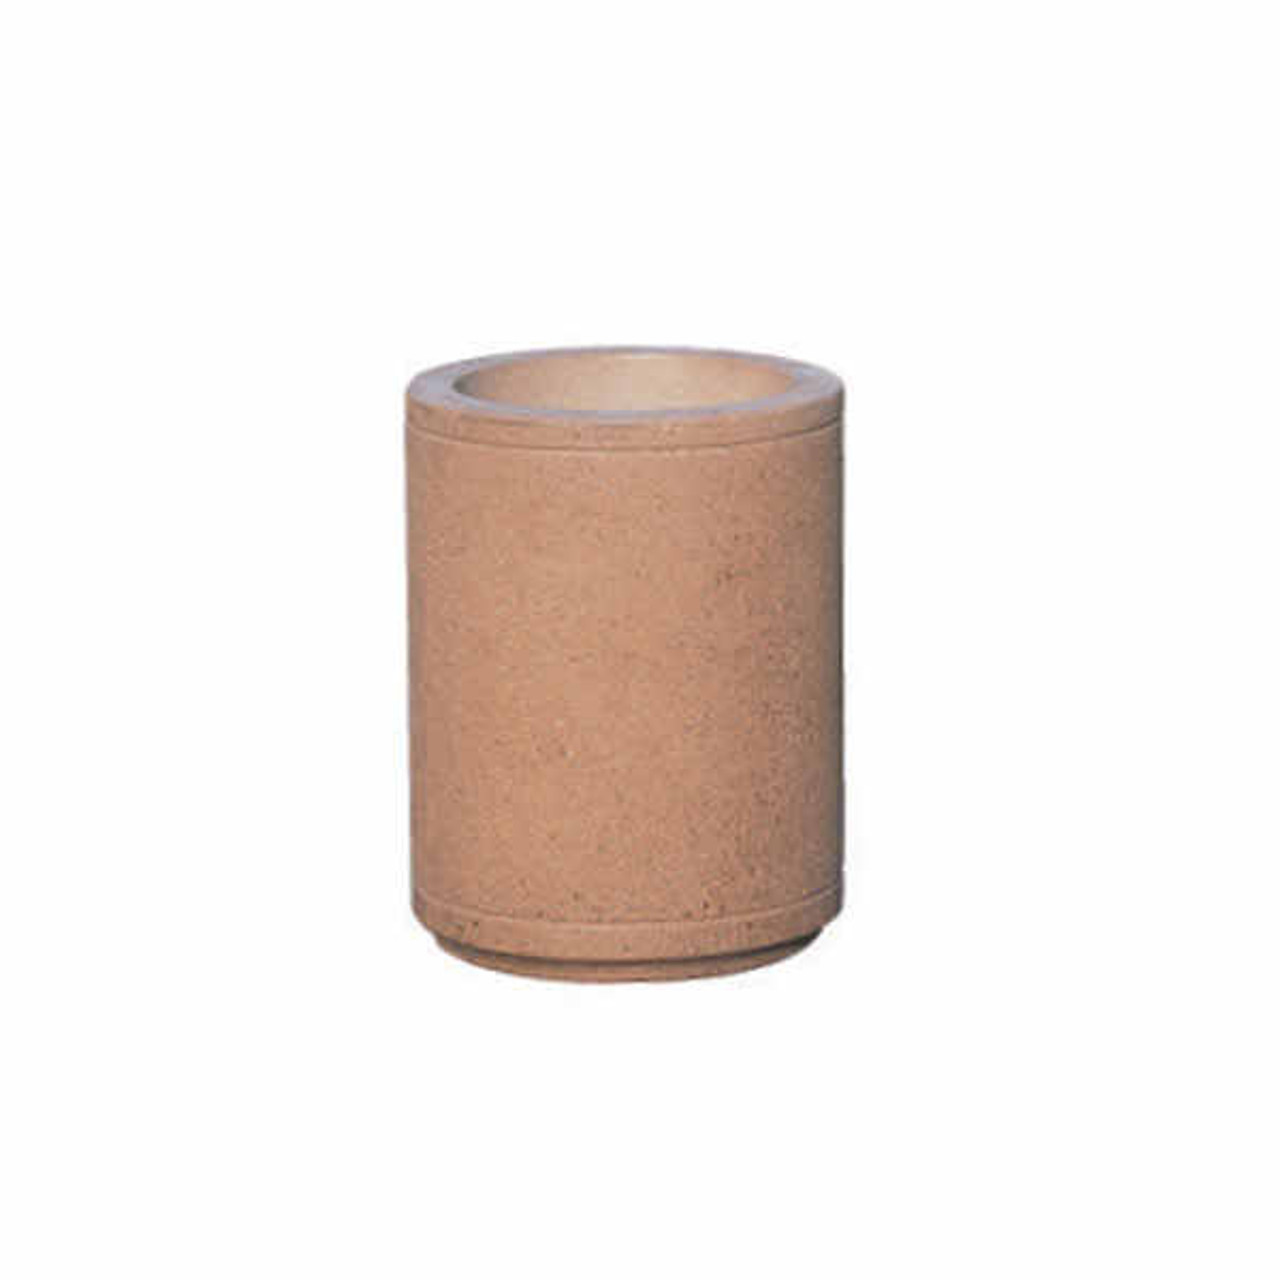 18 x 24 Outdoor Round Concrete Planter TF4070 Weatherstone Sand